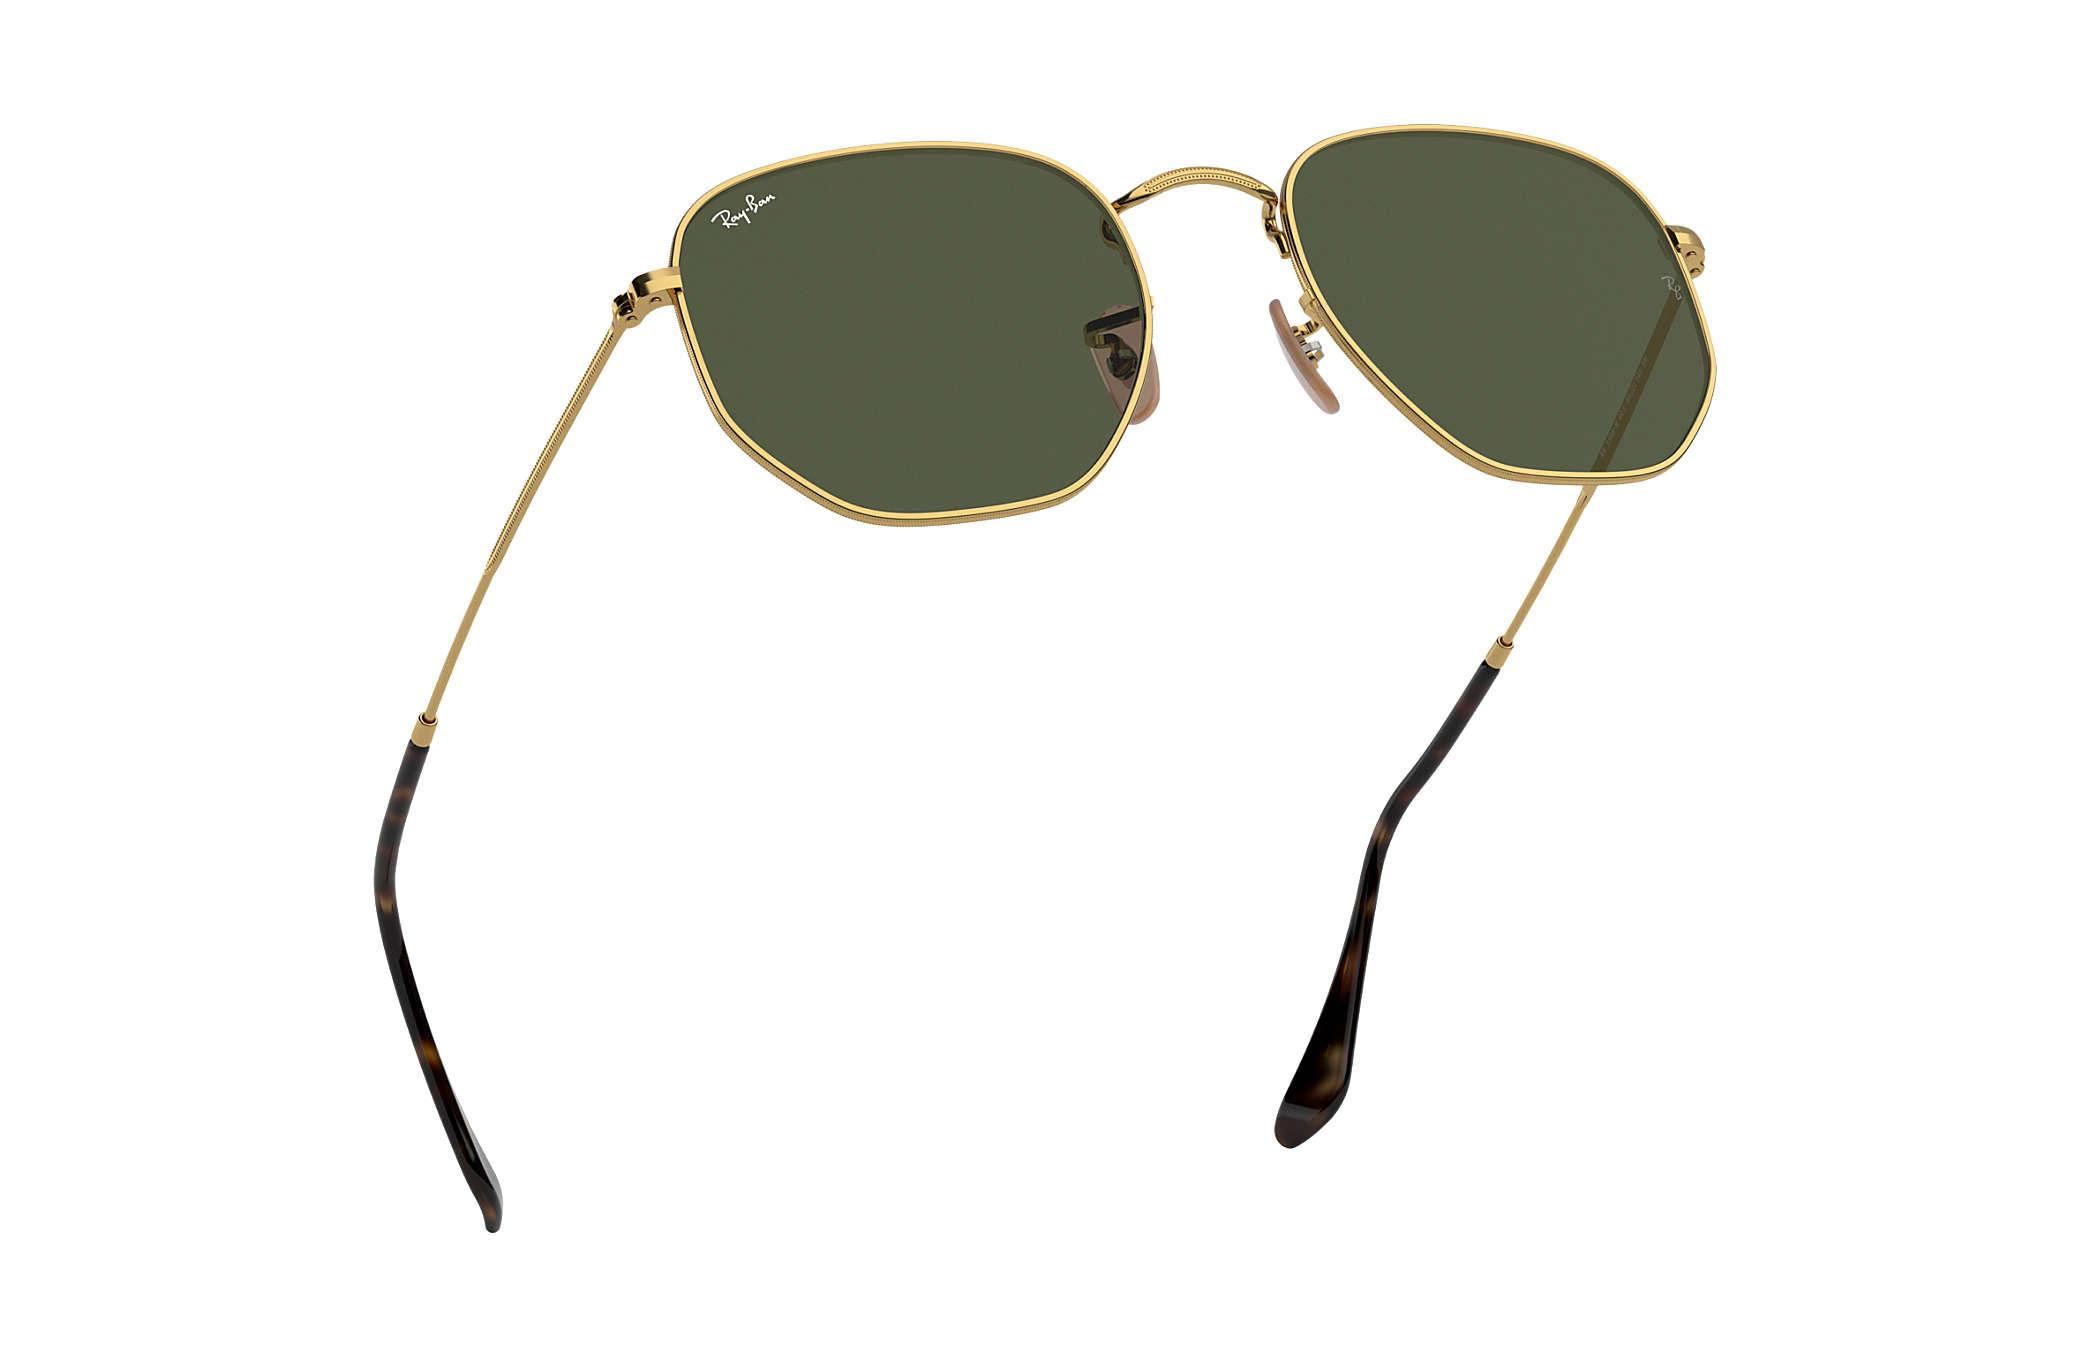 ... buy ray ban 0rb3548n hexagonal flat lenses gold sun 81137 d5dba 206edca0fc